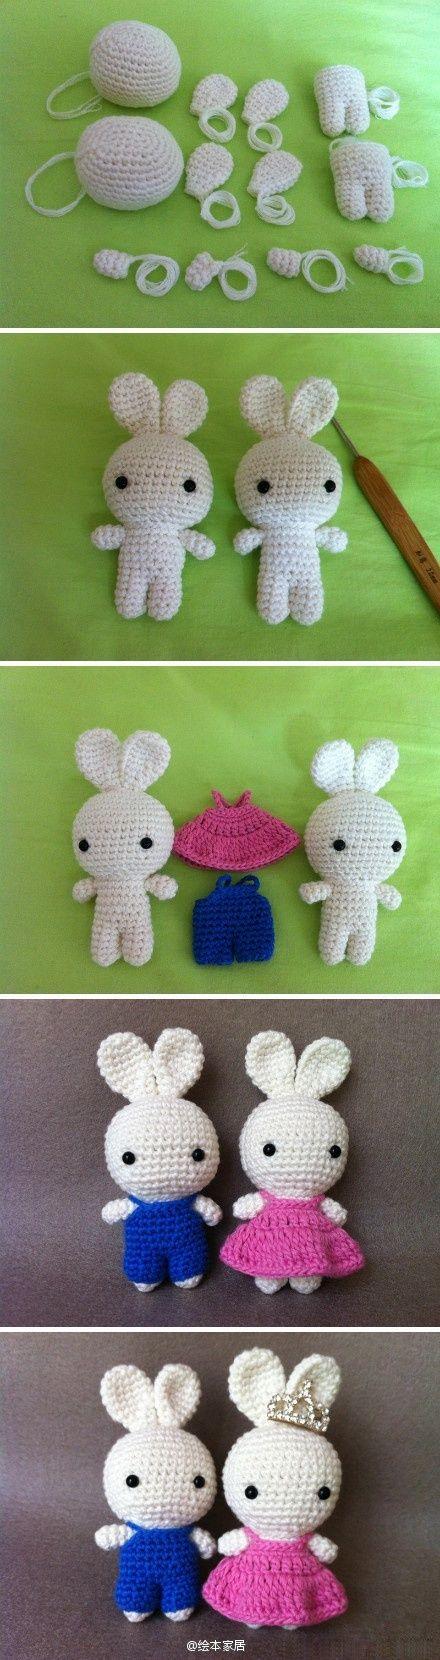 cute pair of bunnies!